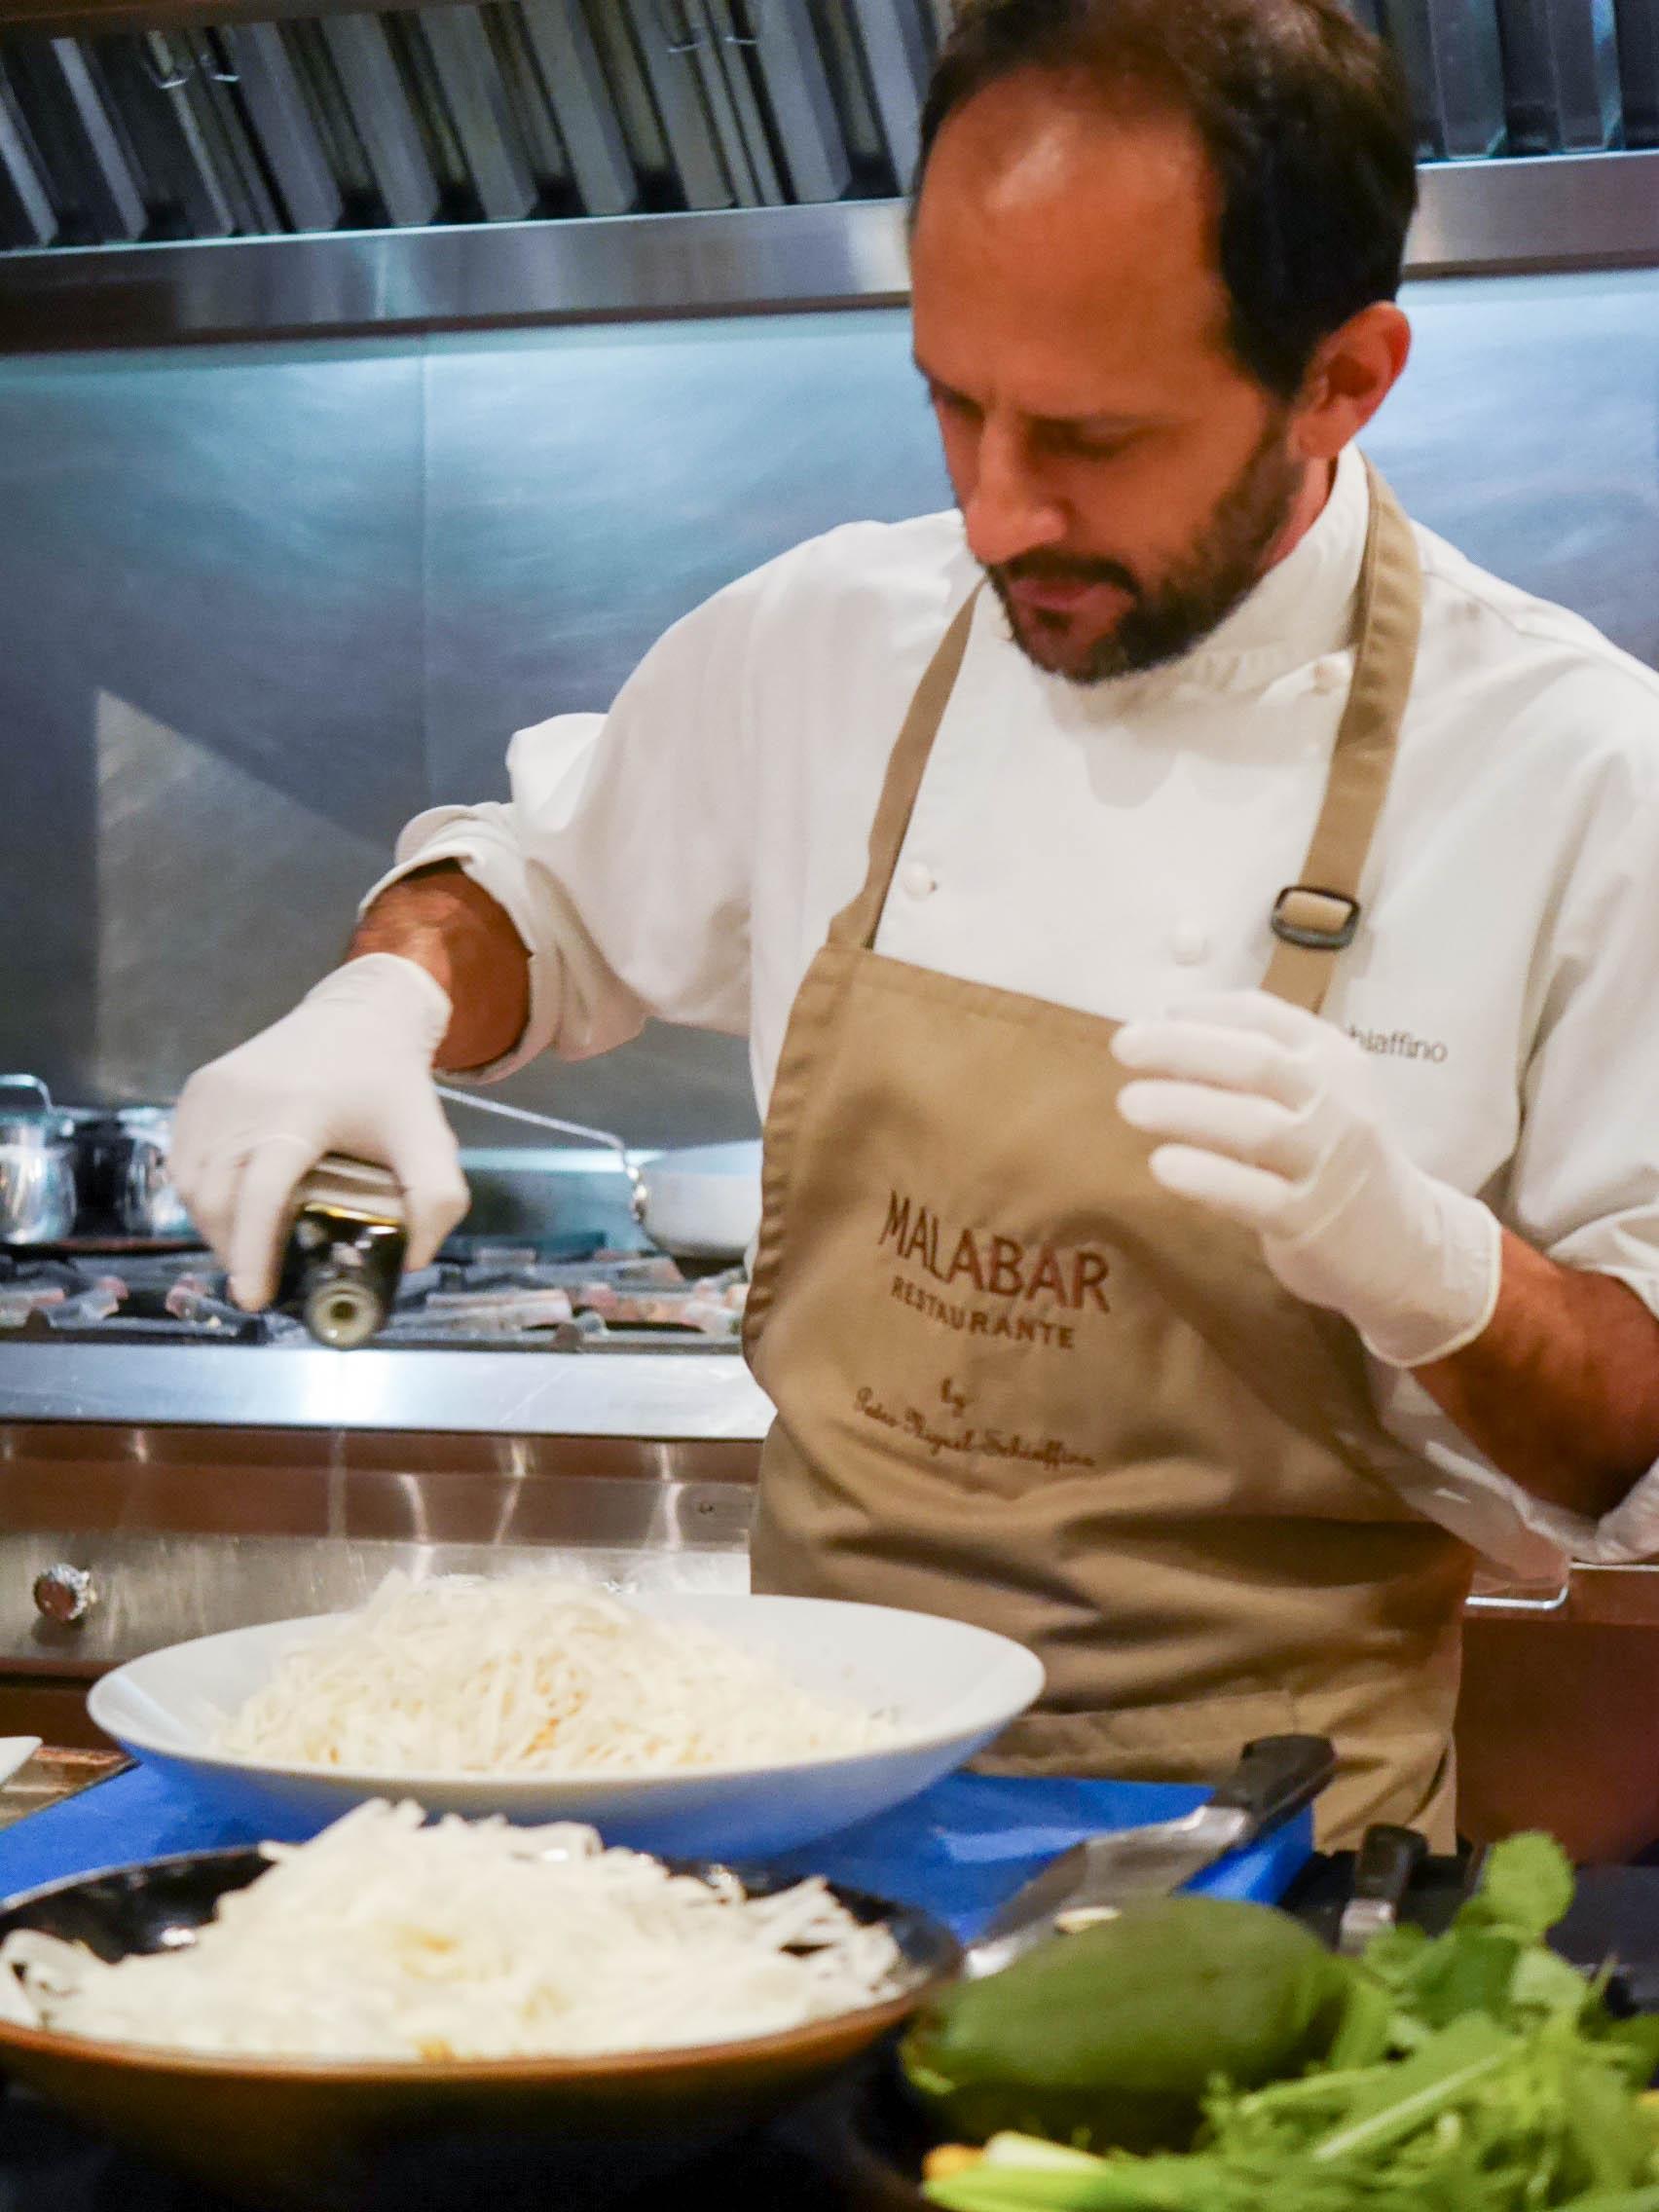 Chef Schiaffino